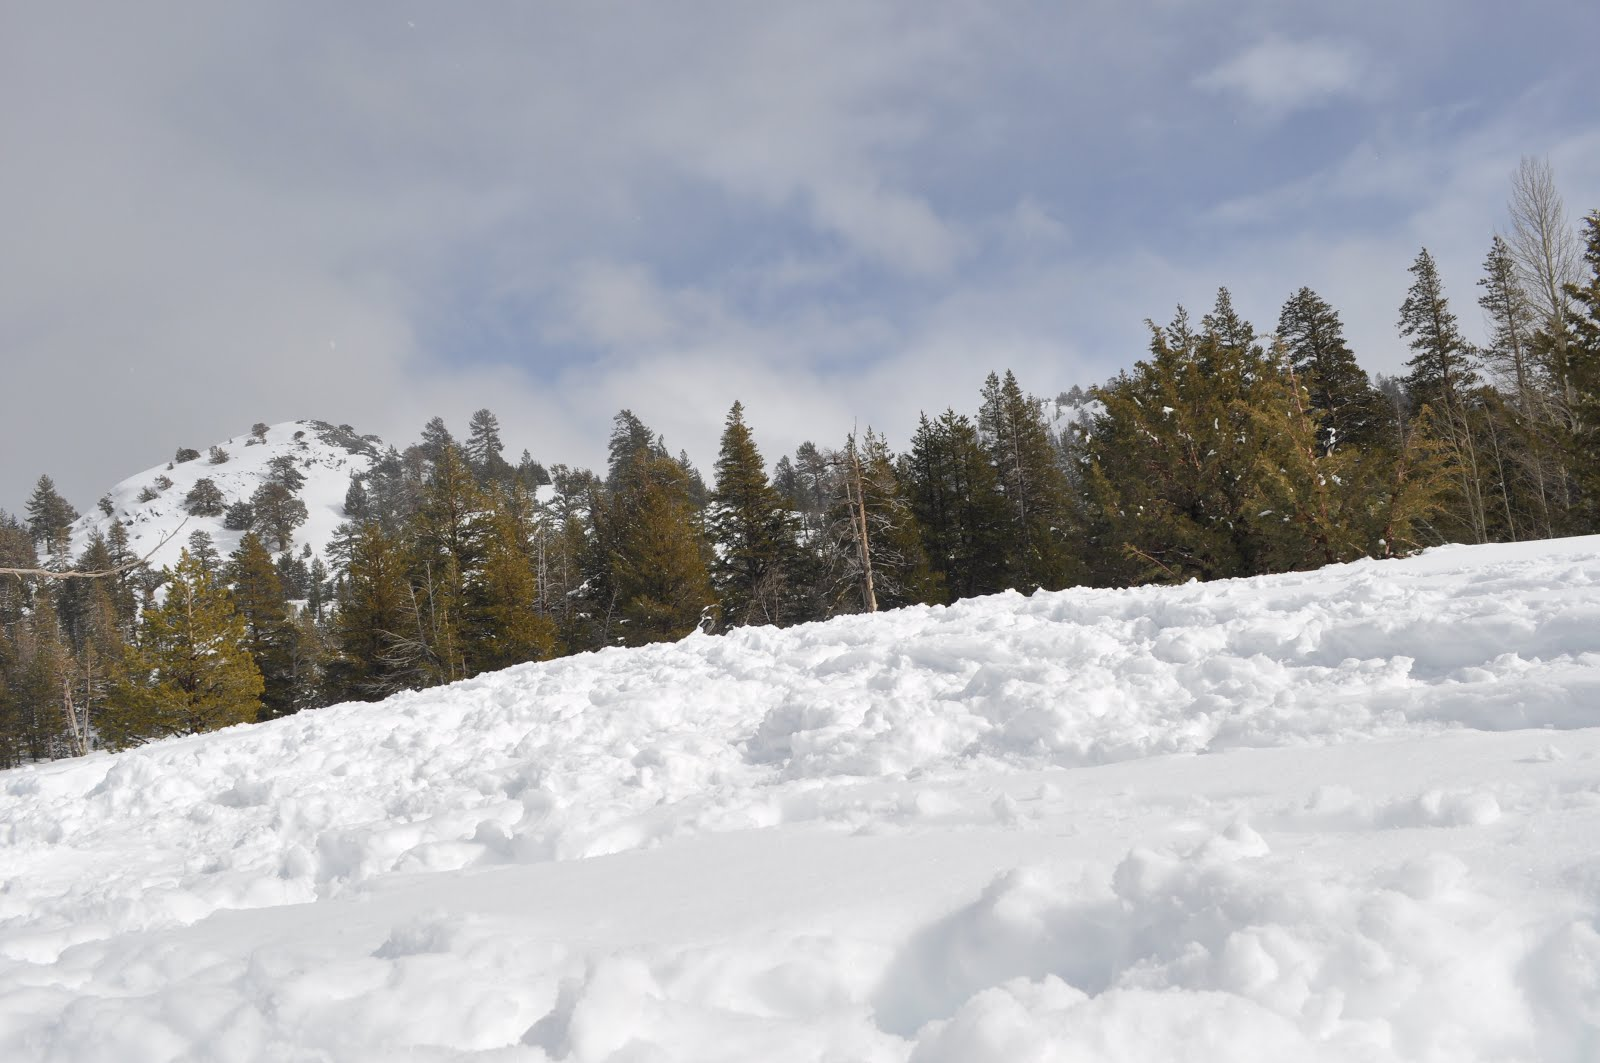 Potluri Travelling Blog : Tahoe snow storm (Arshiya Tahoe trip)